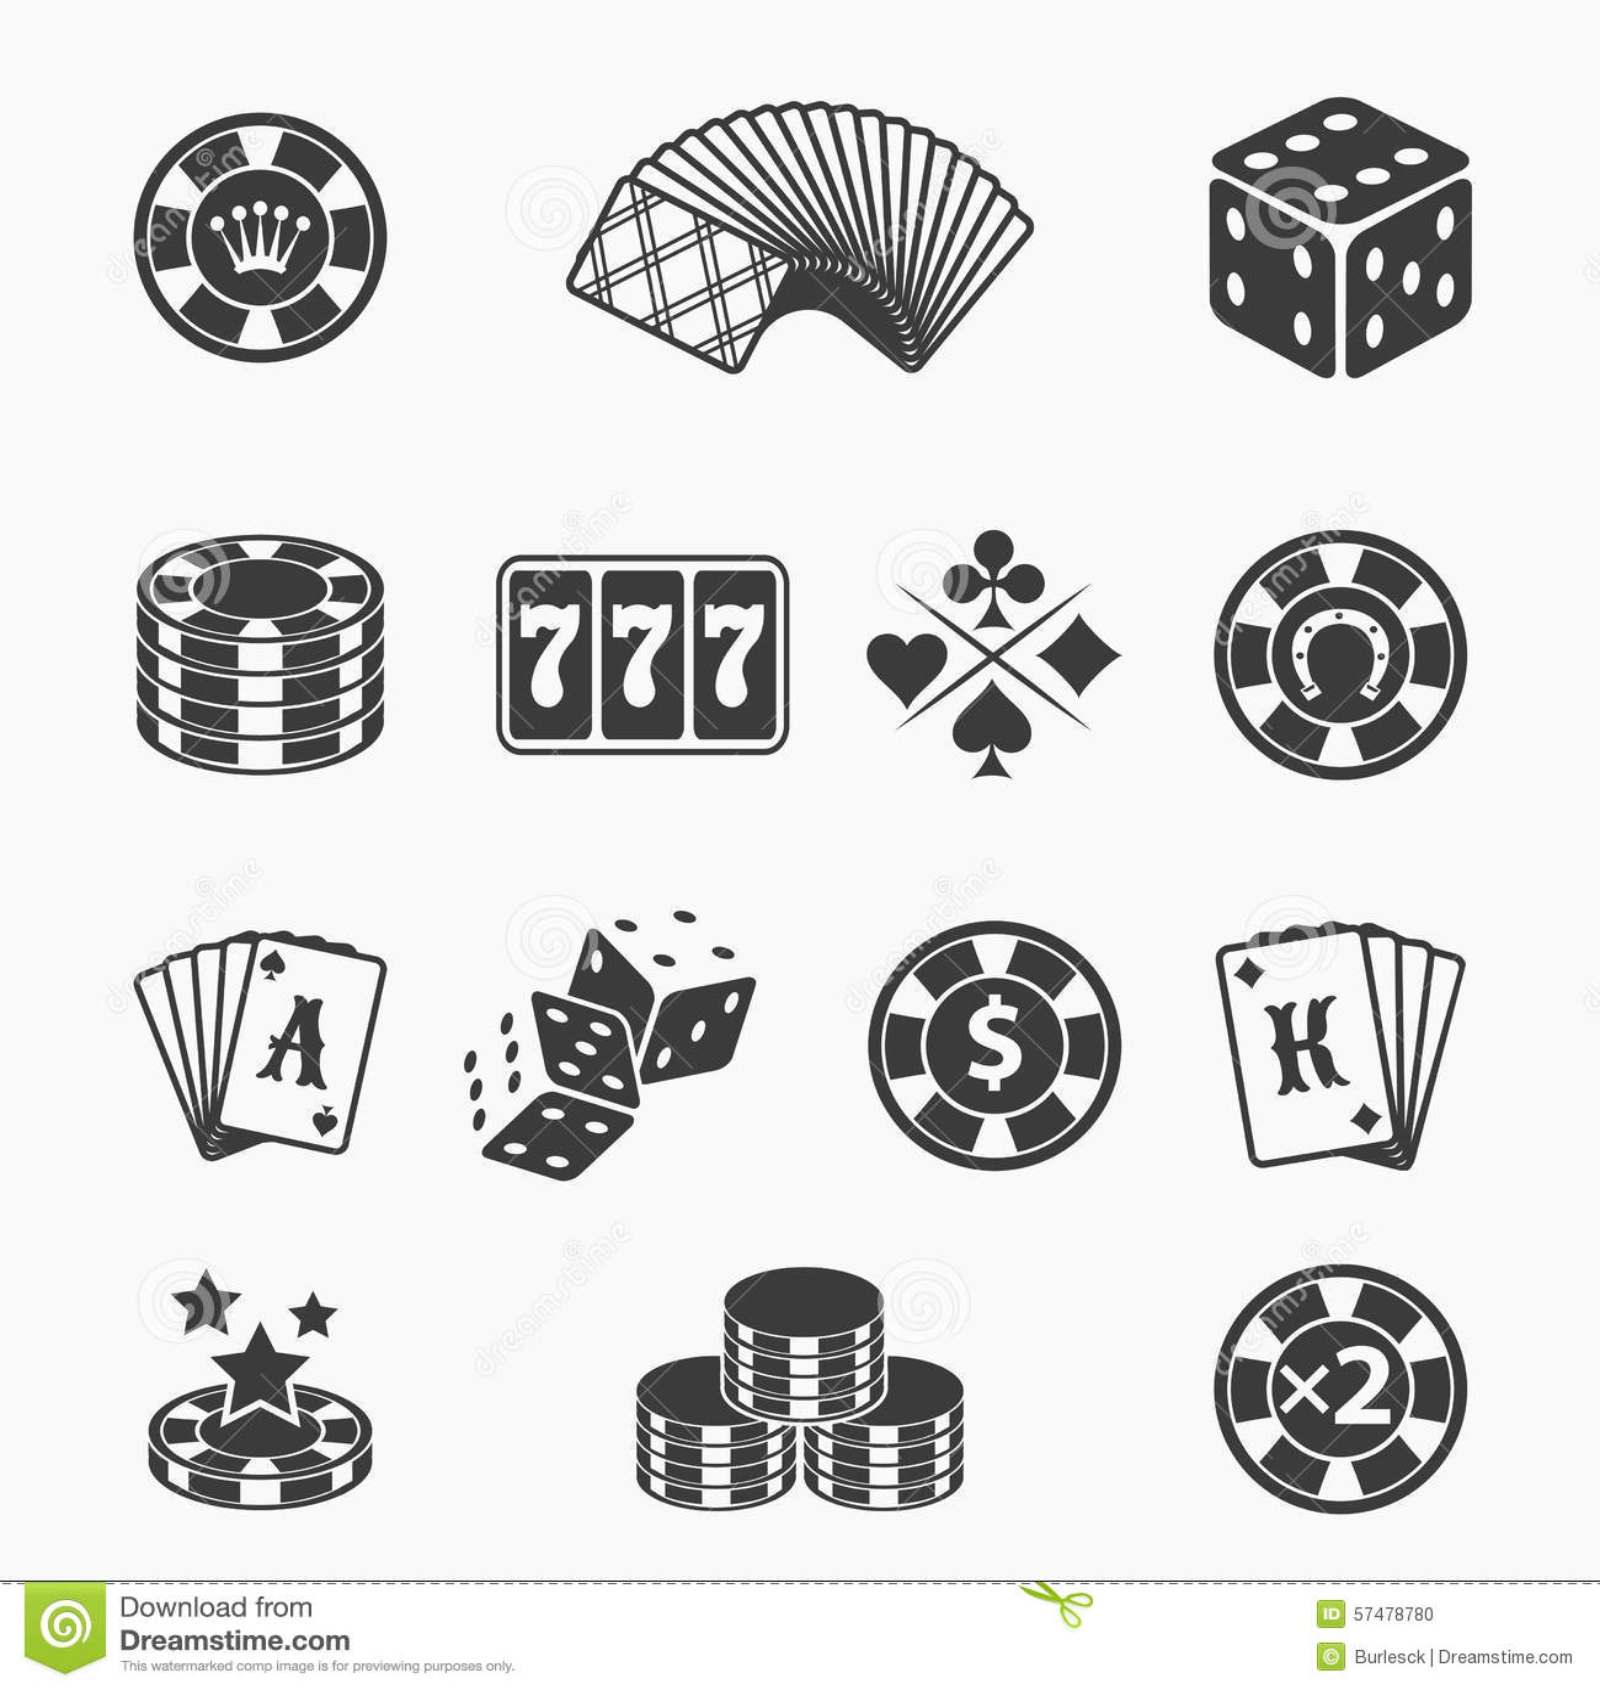 Jugar black jack online giros gratis casino La Plata-674713